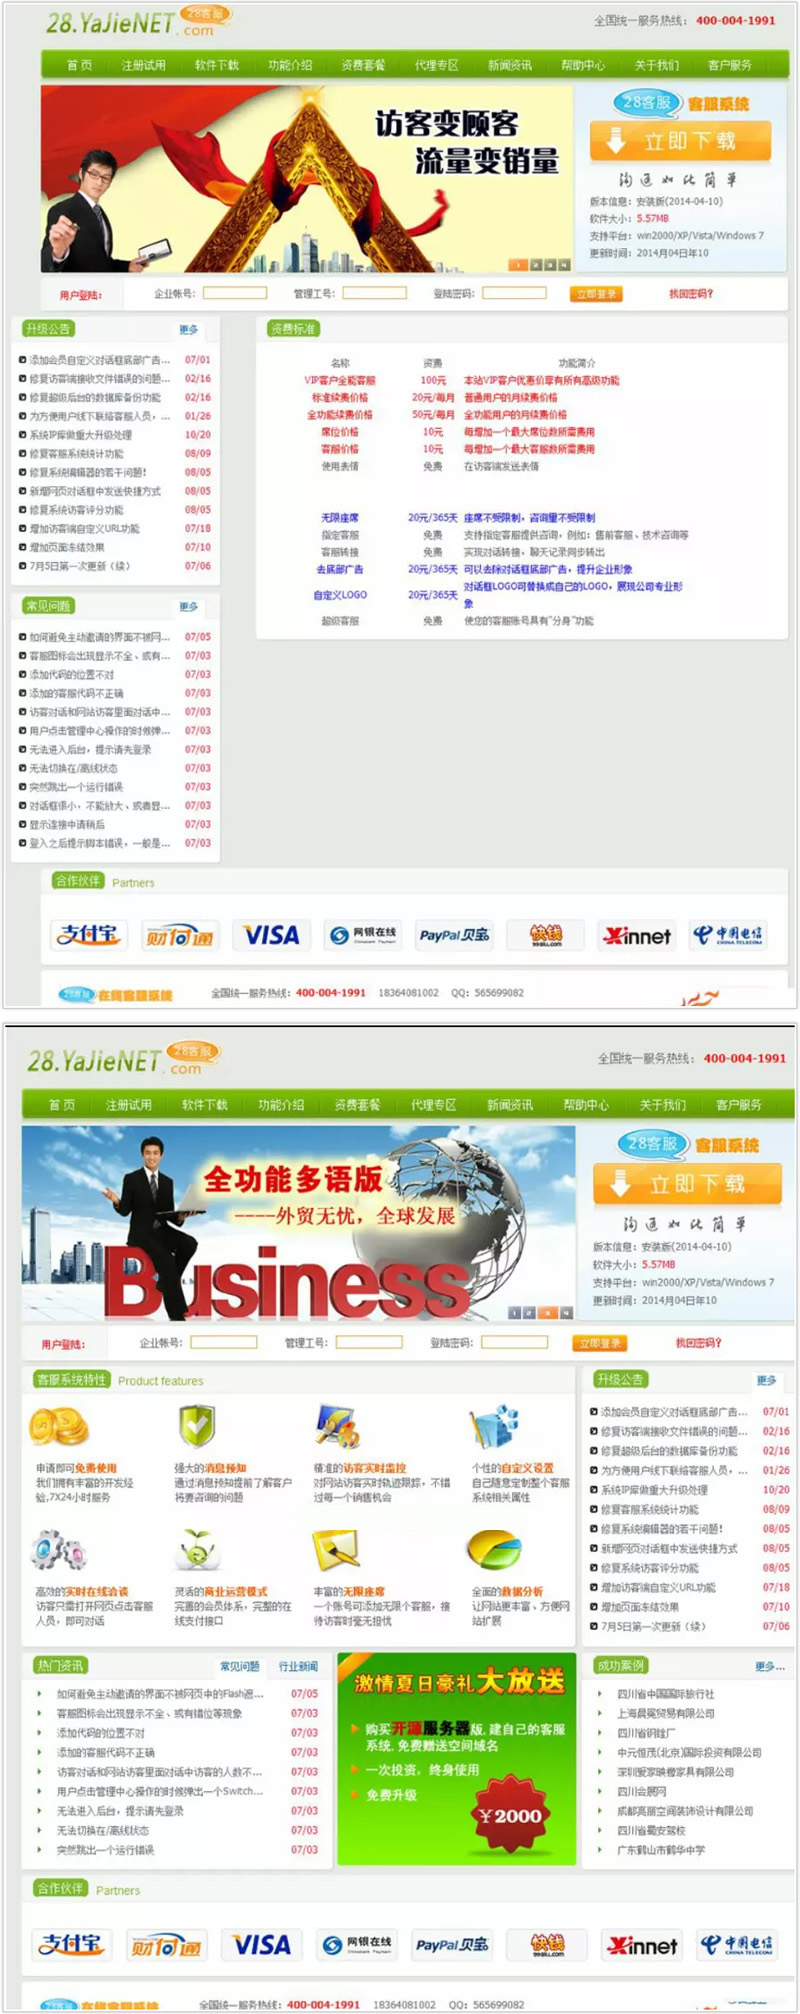 PHP仿25客服在线客服系统商业版网站源码 前后台完整新版-爱资源分享